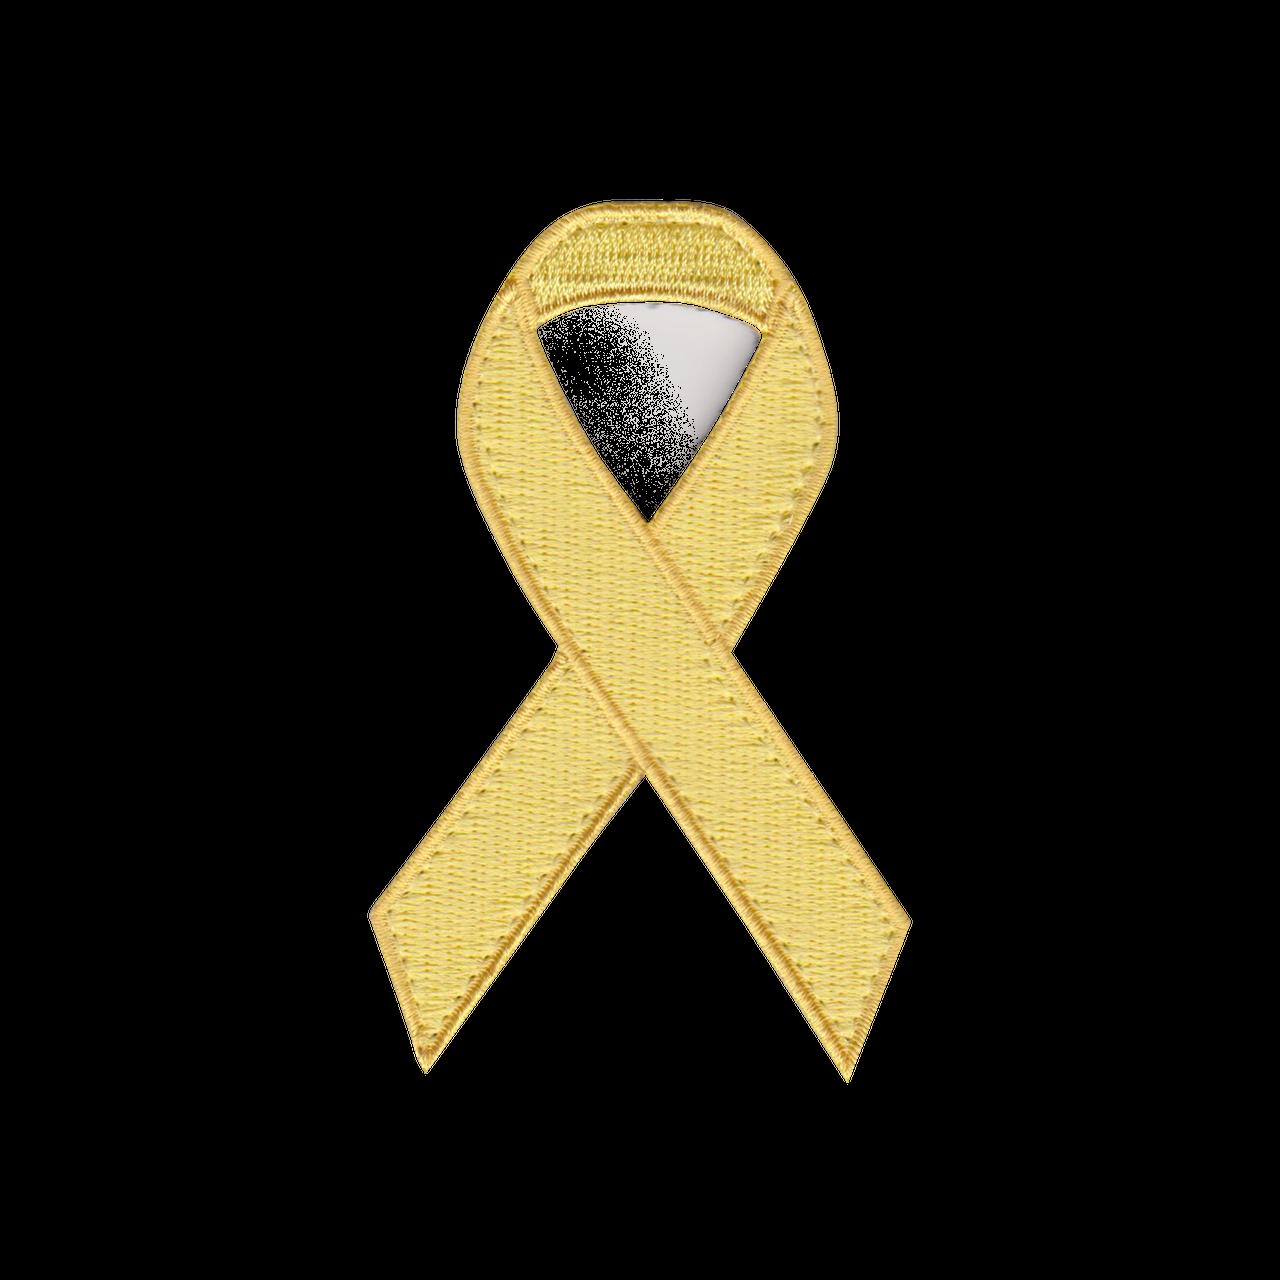 Yellow Awareness Ribbon Patch Marucci Sports